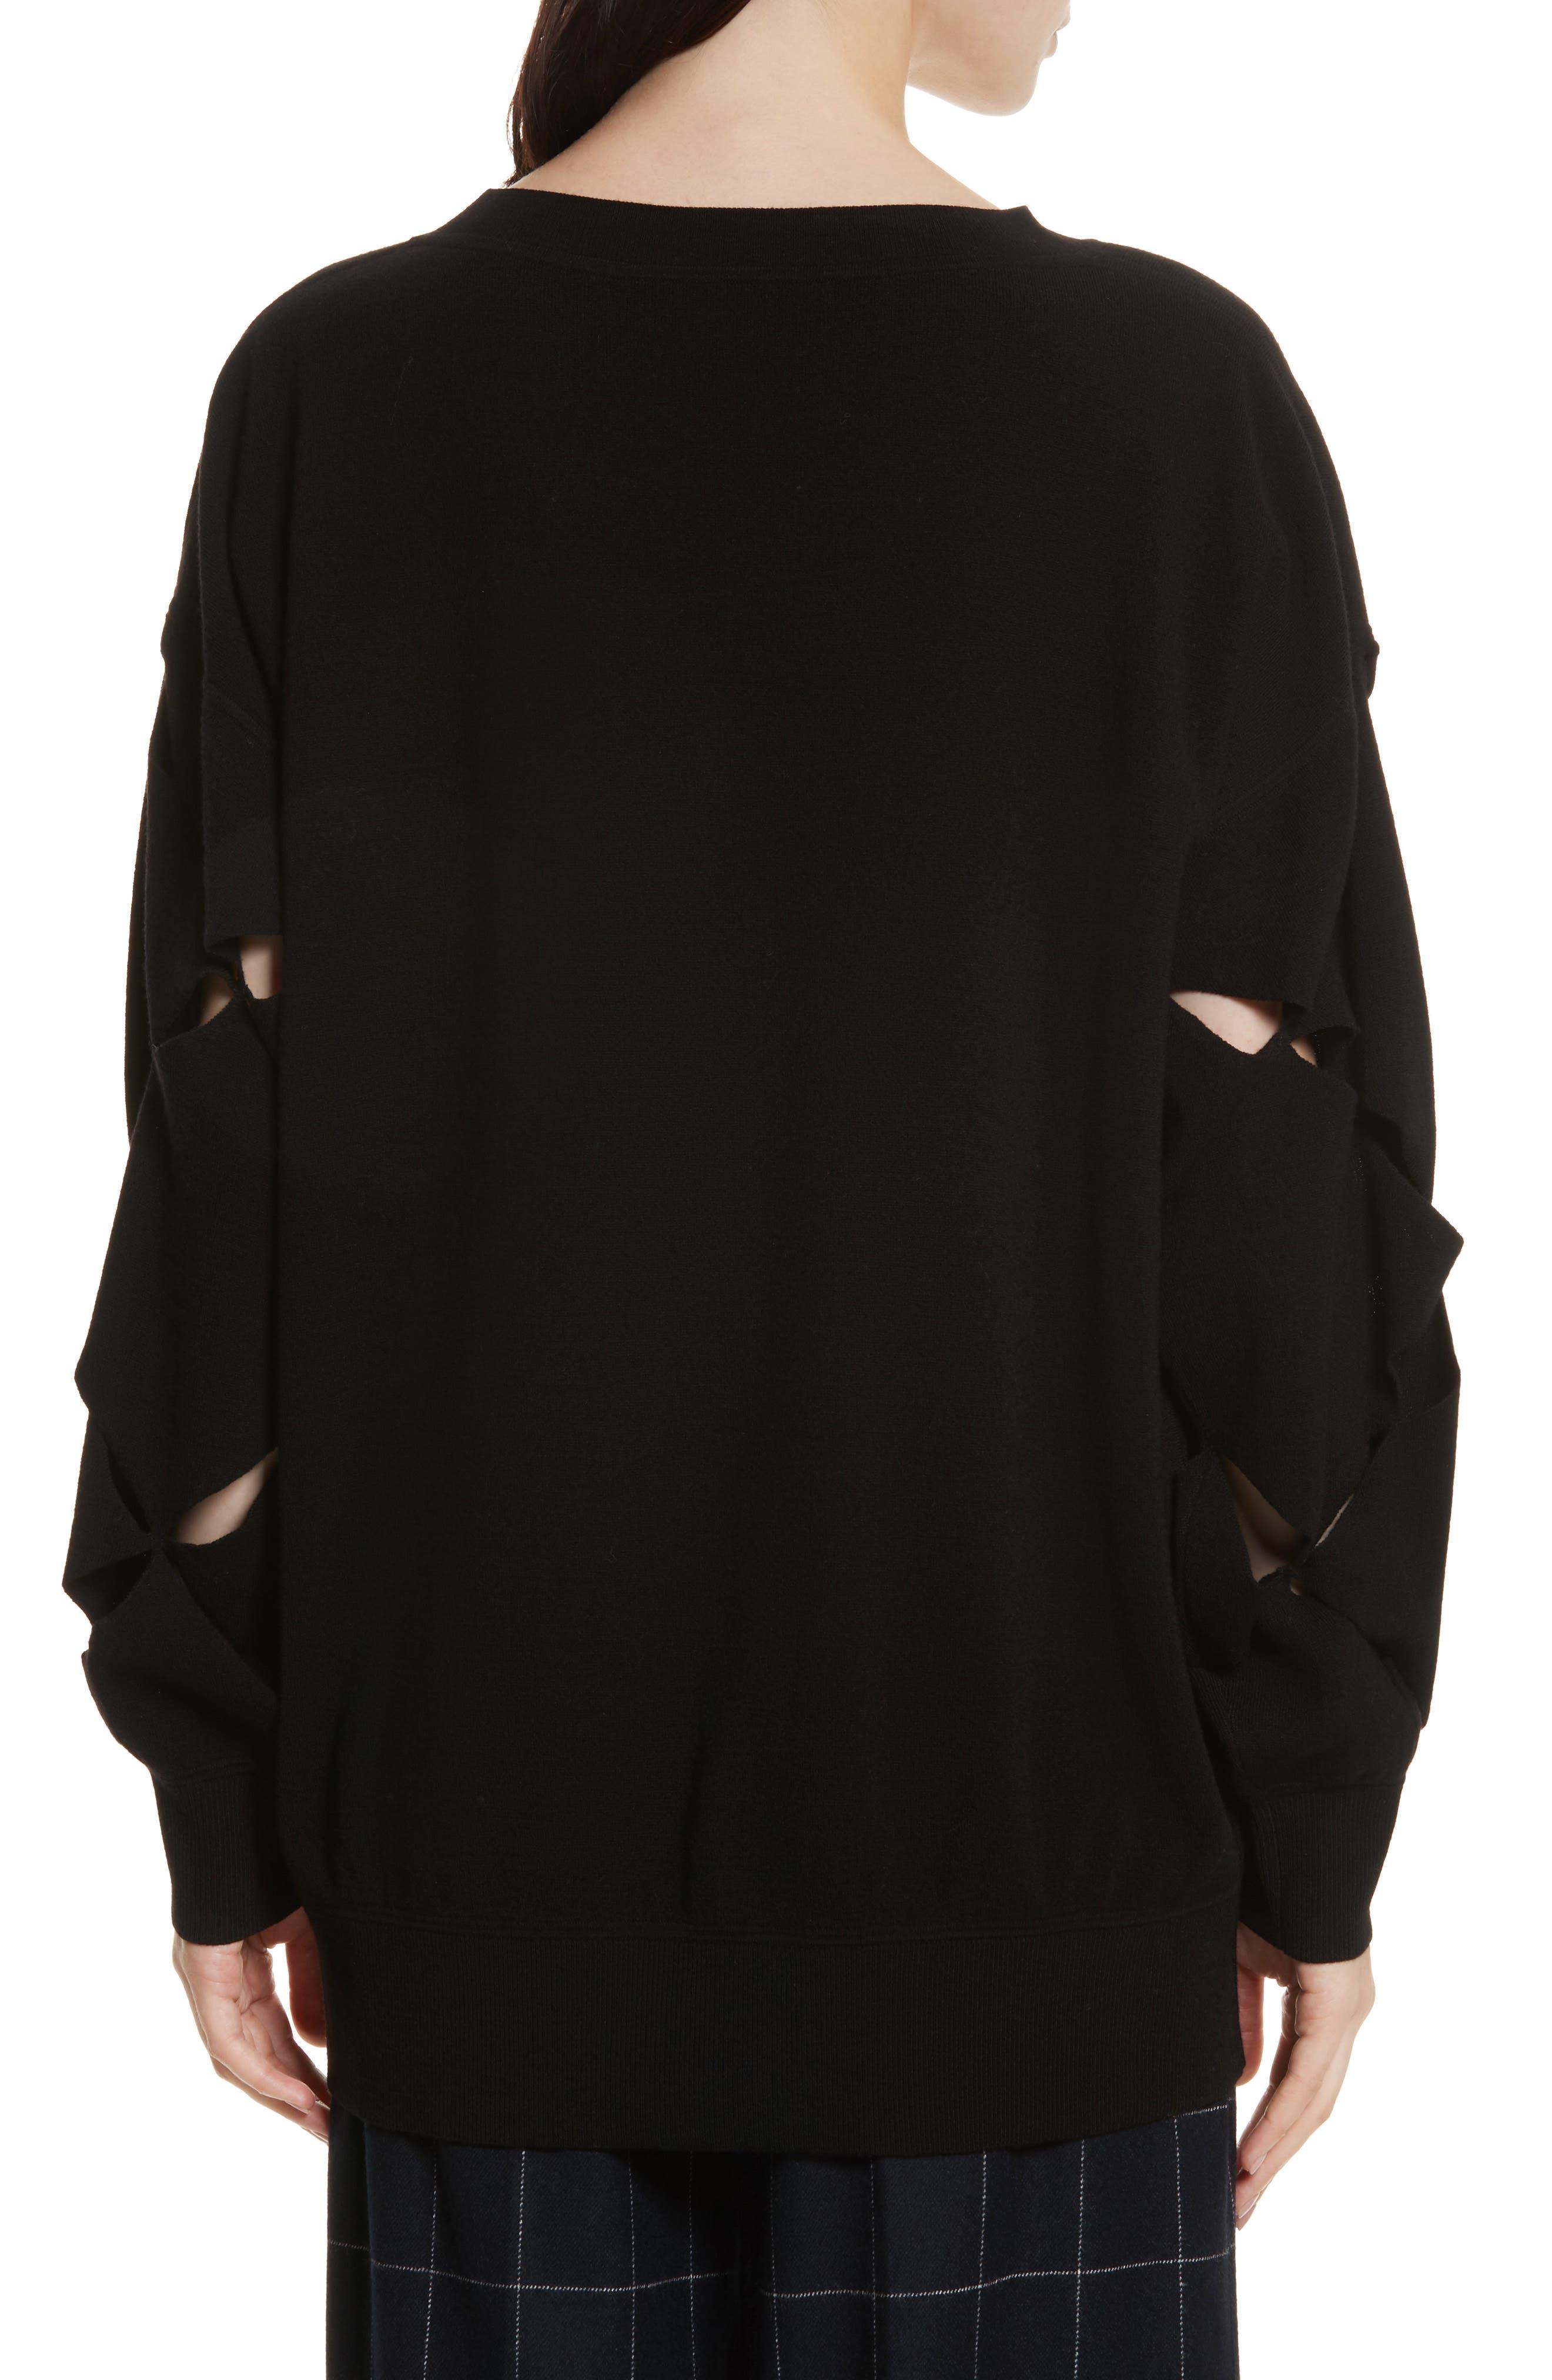 Roz Cutout Sweater,                             Alternate thumbnail 2, color,                             Black